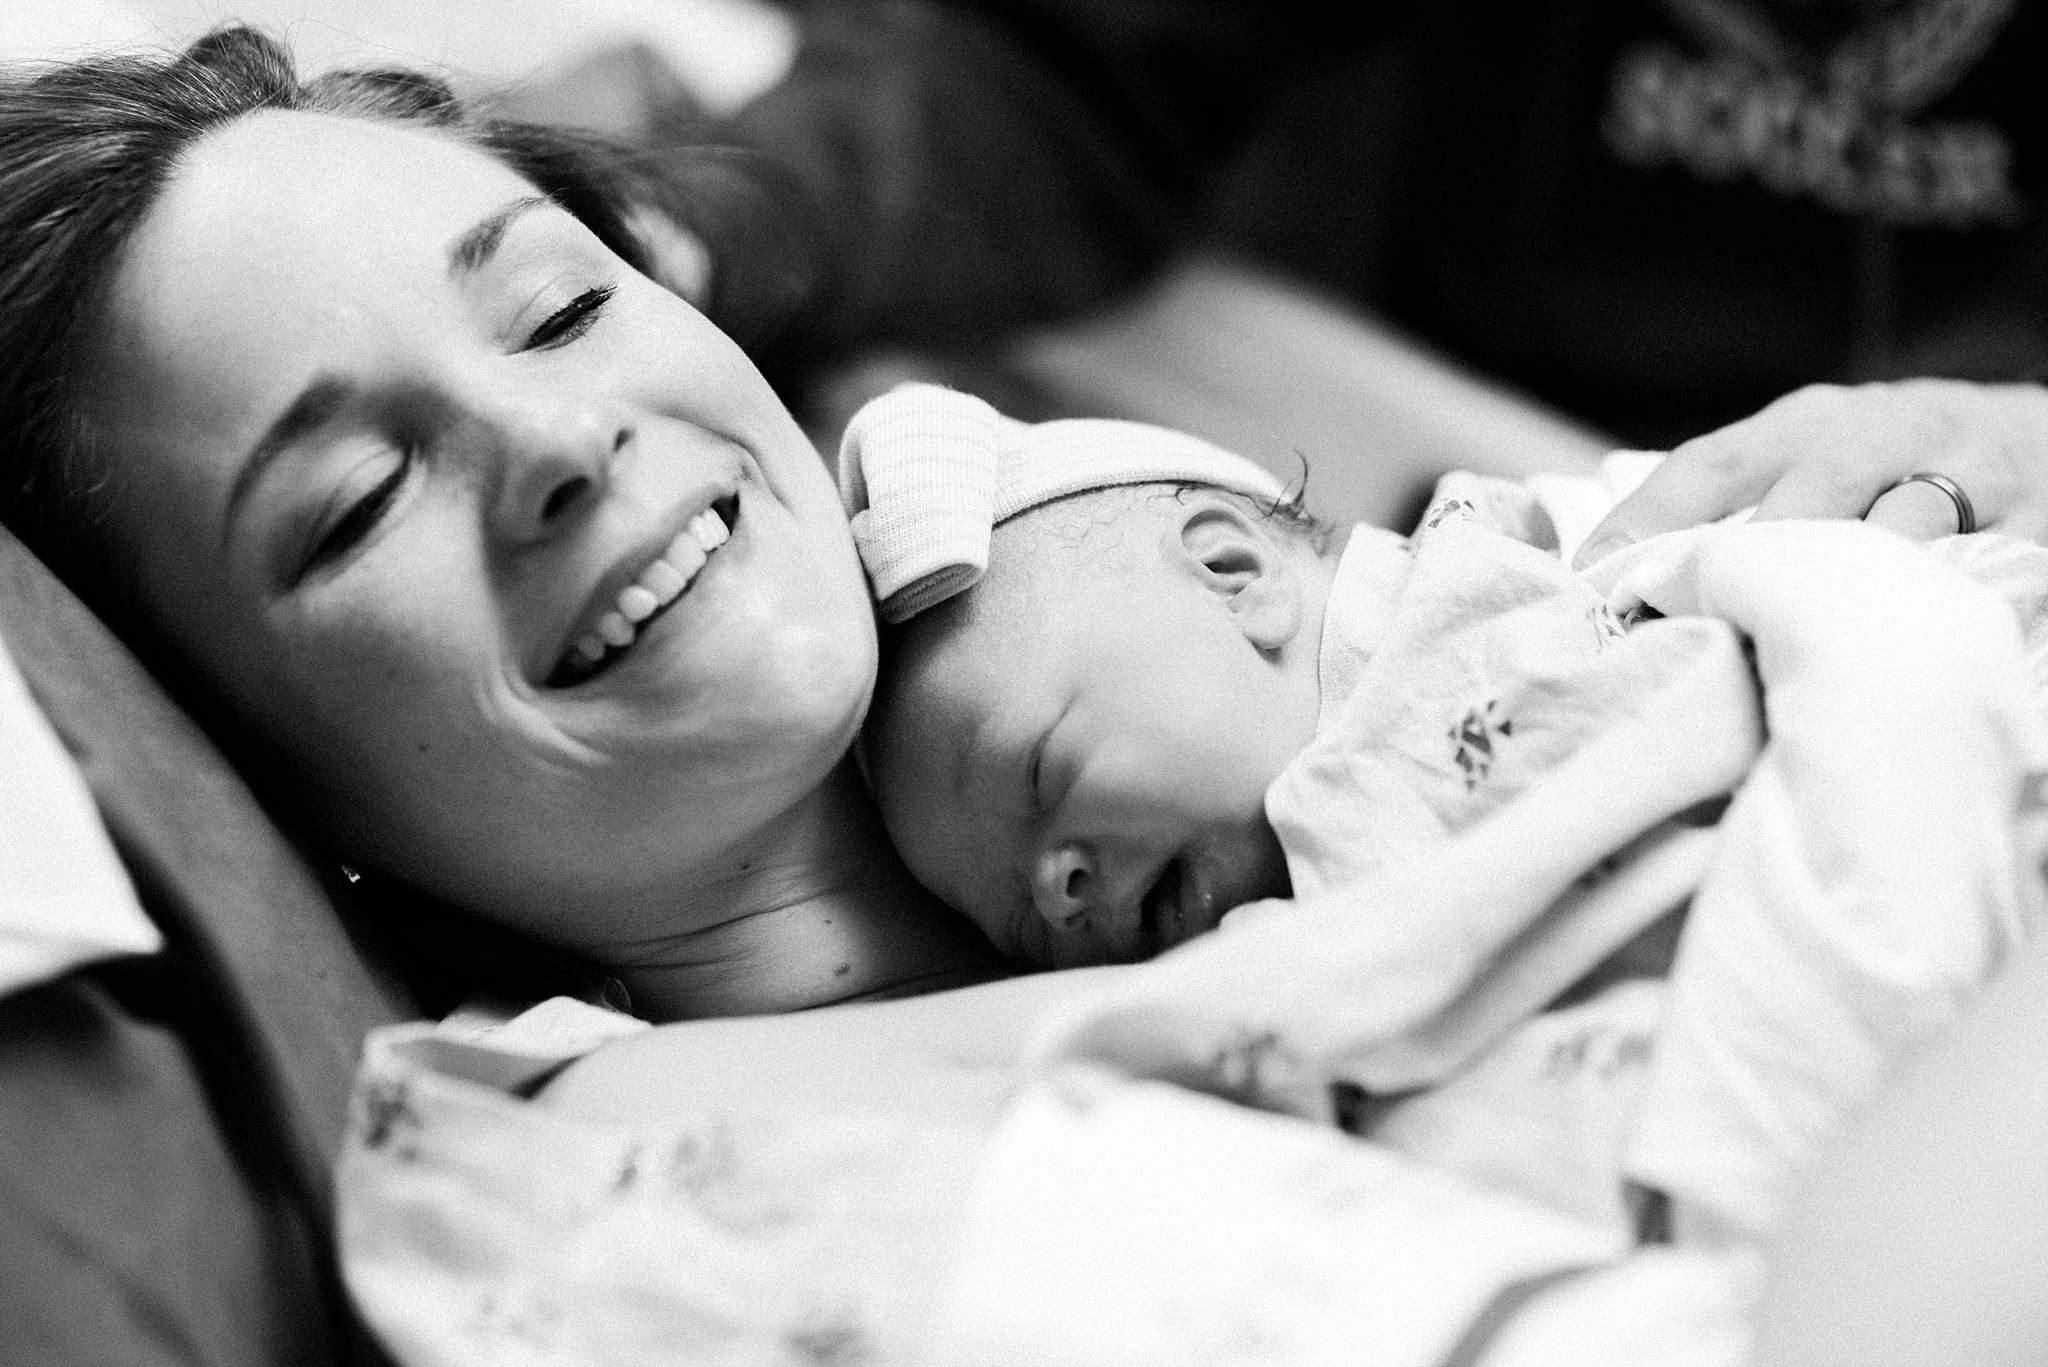 fayetteville-georgia-piedmont-fayette-hospital-birth-photography-sarahmoore-24.jpg